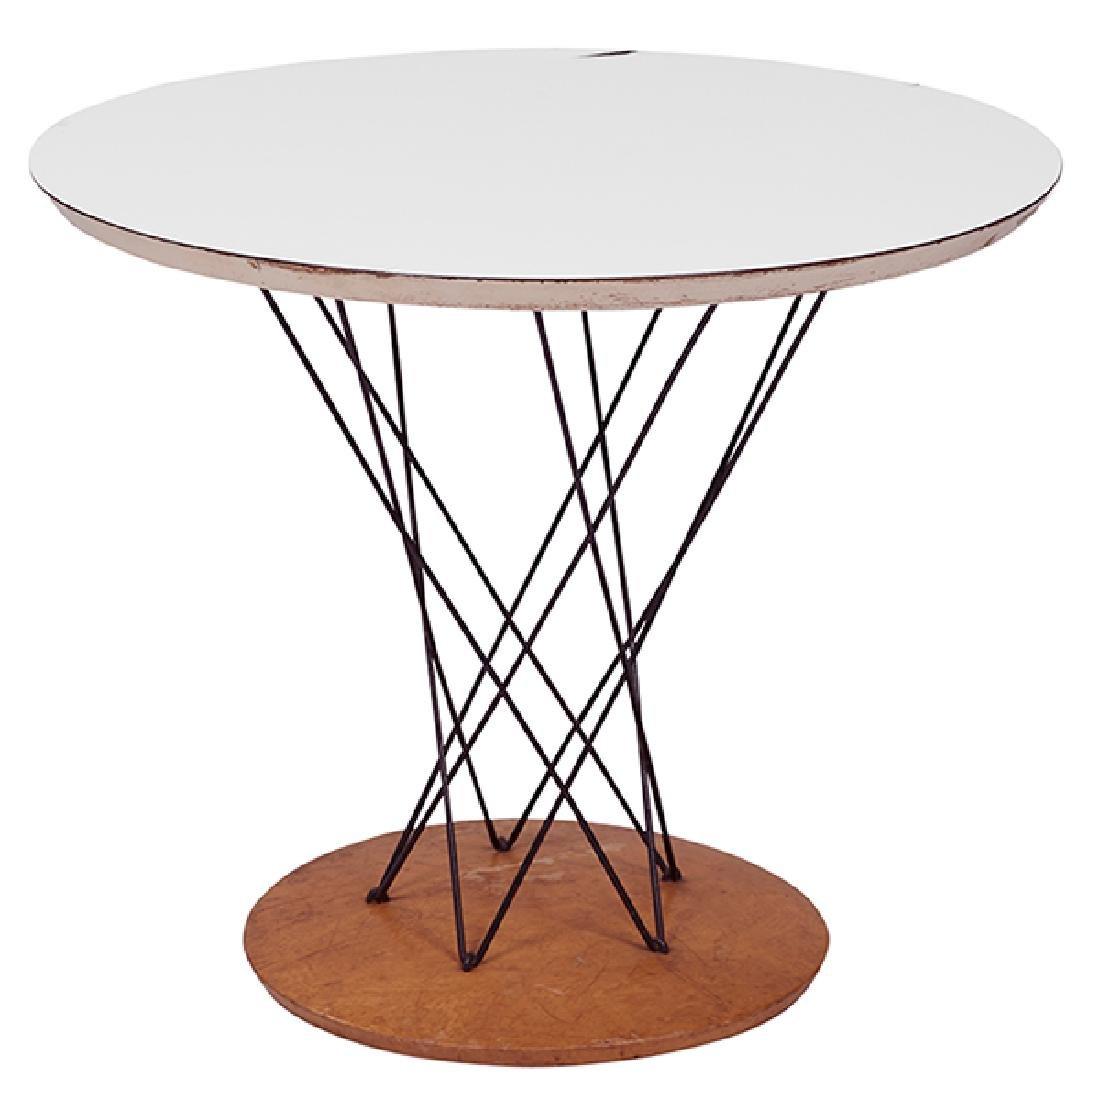 "Isamu Noguchi Cyclone table 24""dia x 20""h"